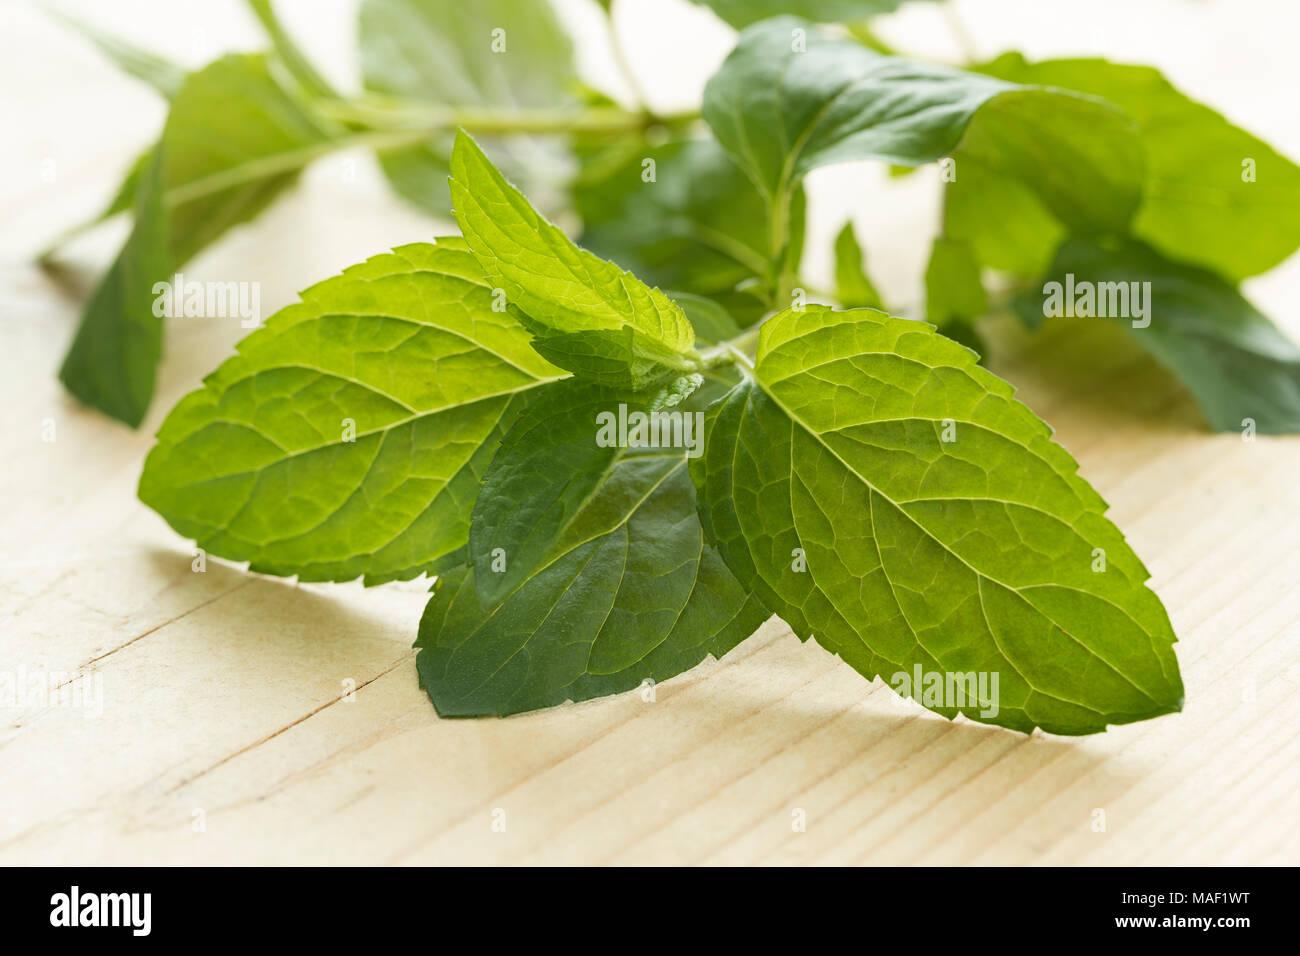 Twig of fresh green chocolat mint close up - Stock Image